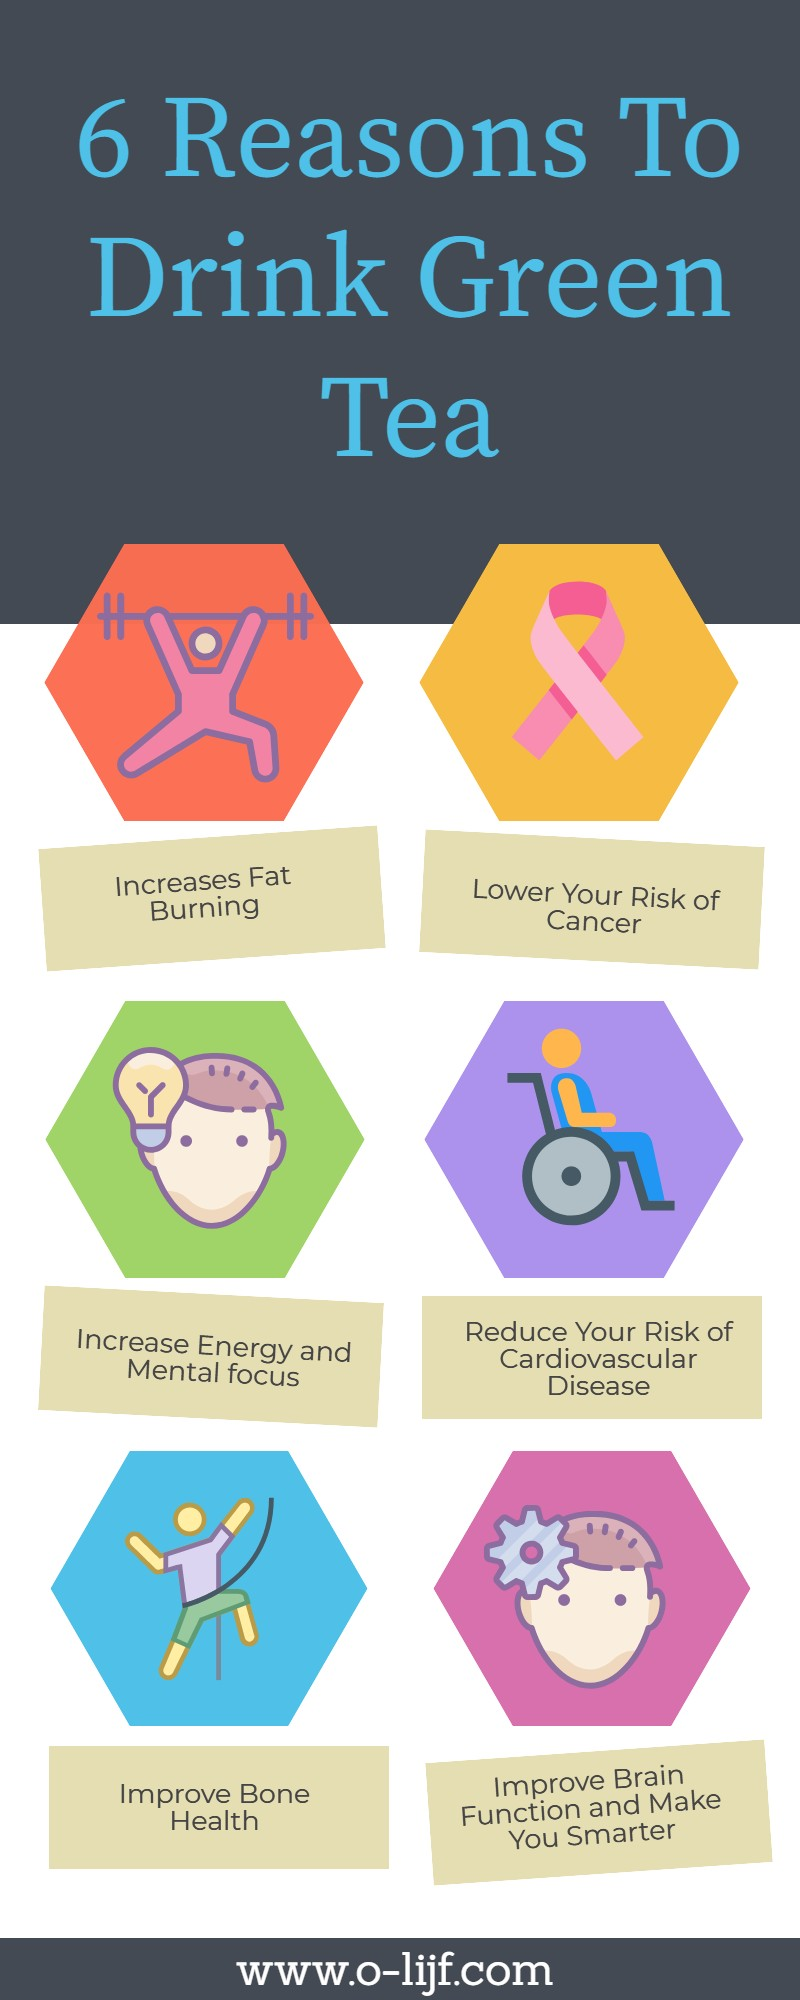 6 Reasons To Drink Green Tea